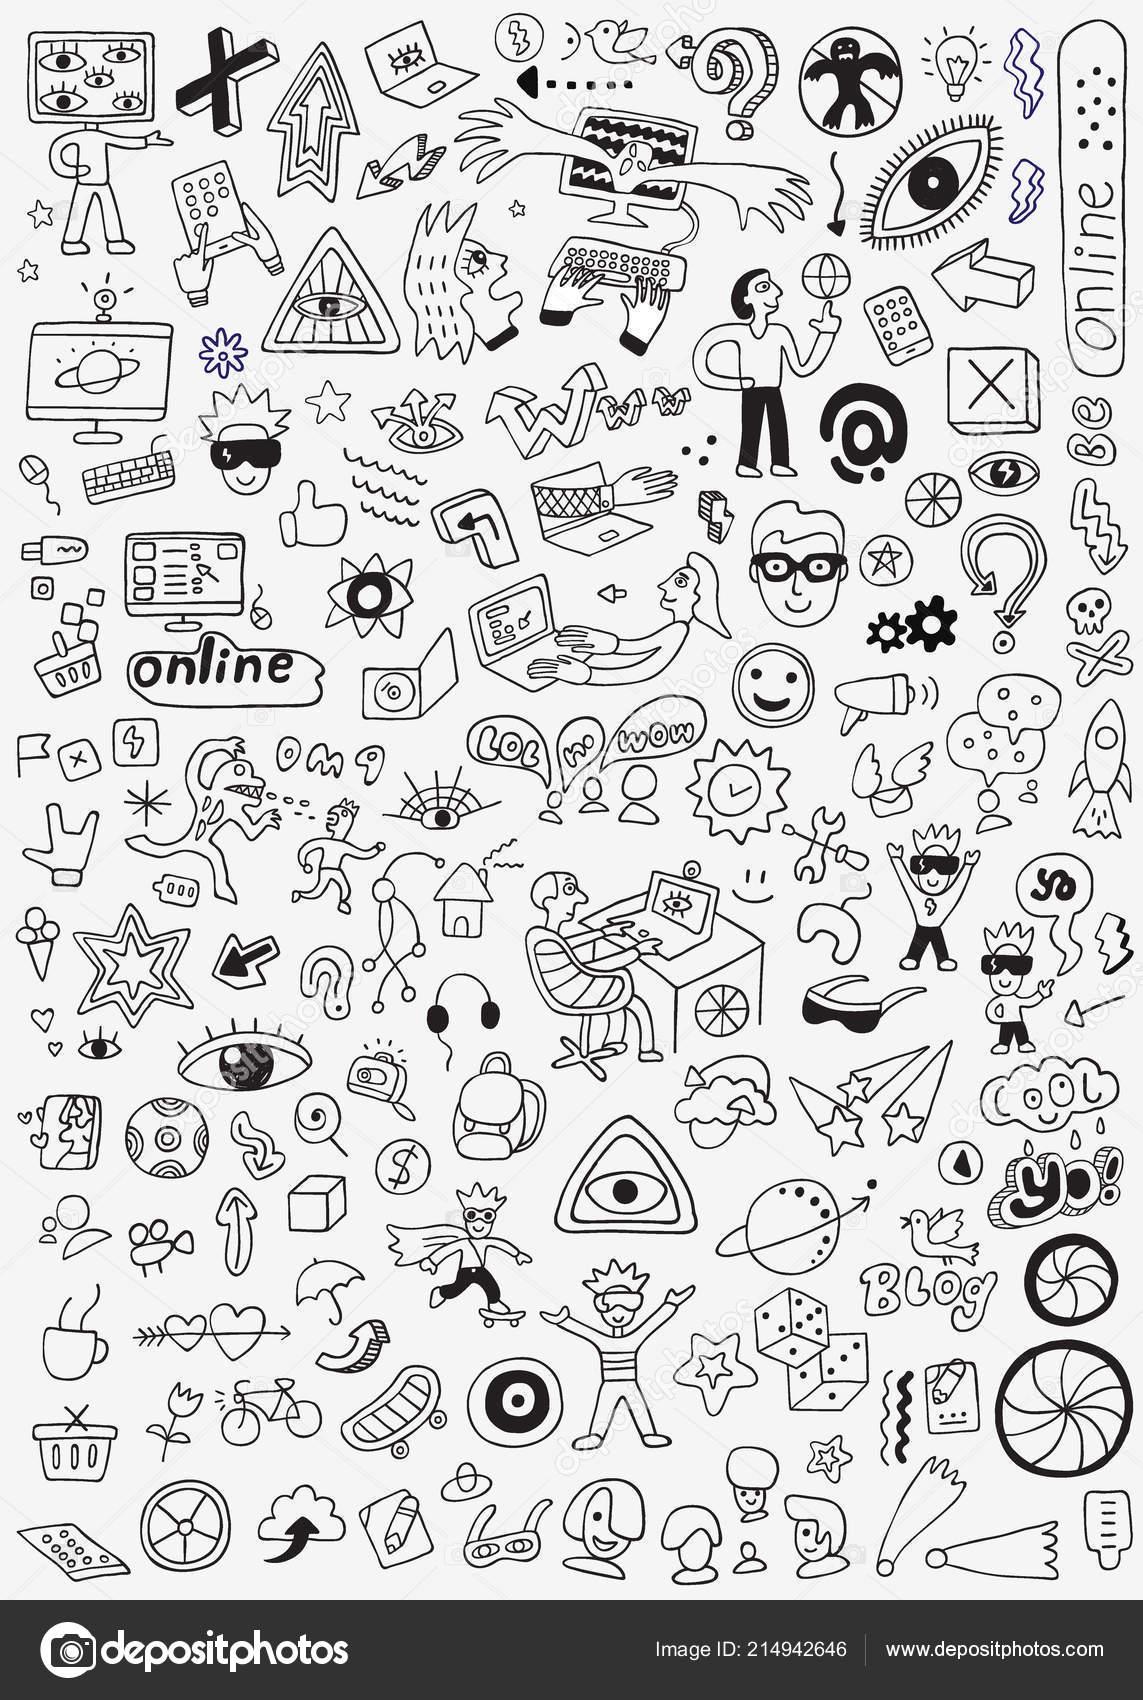 Disegni Cartoni Animati A Matita Tecnologia Internet Scarabocchio